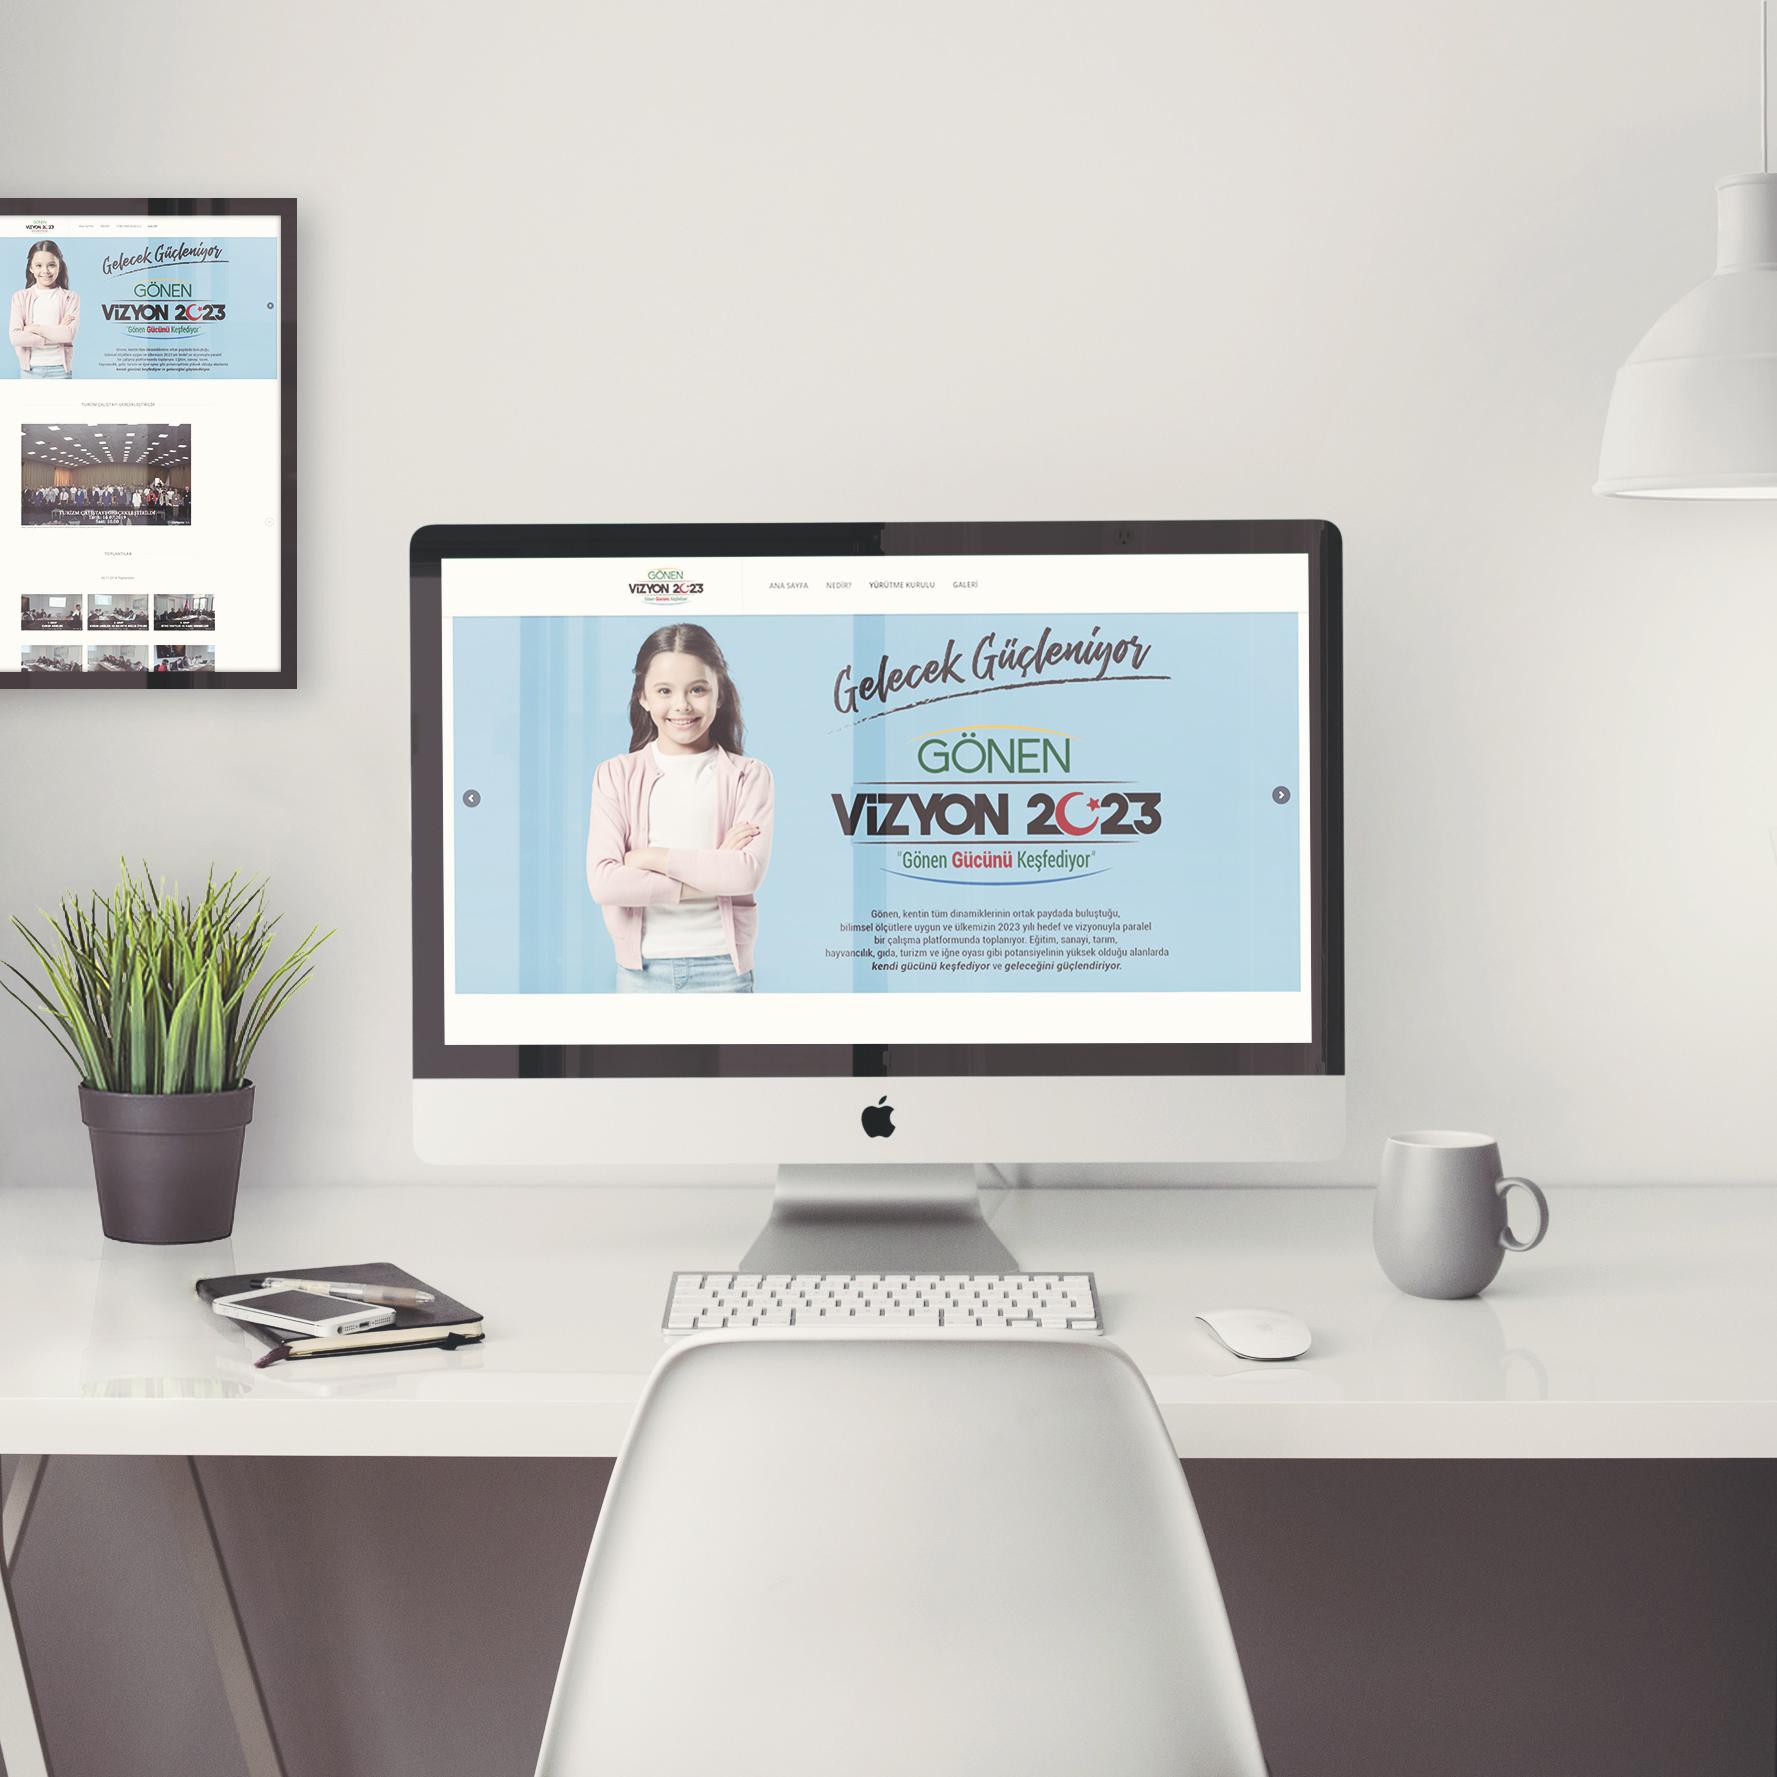 Gönen Vizyon 2023 Web Site